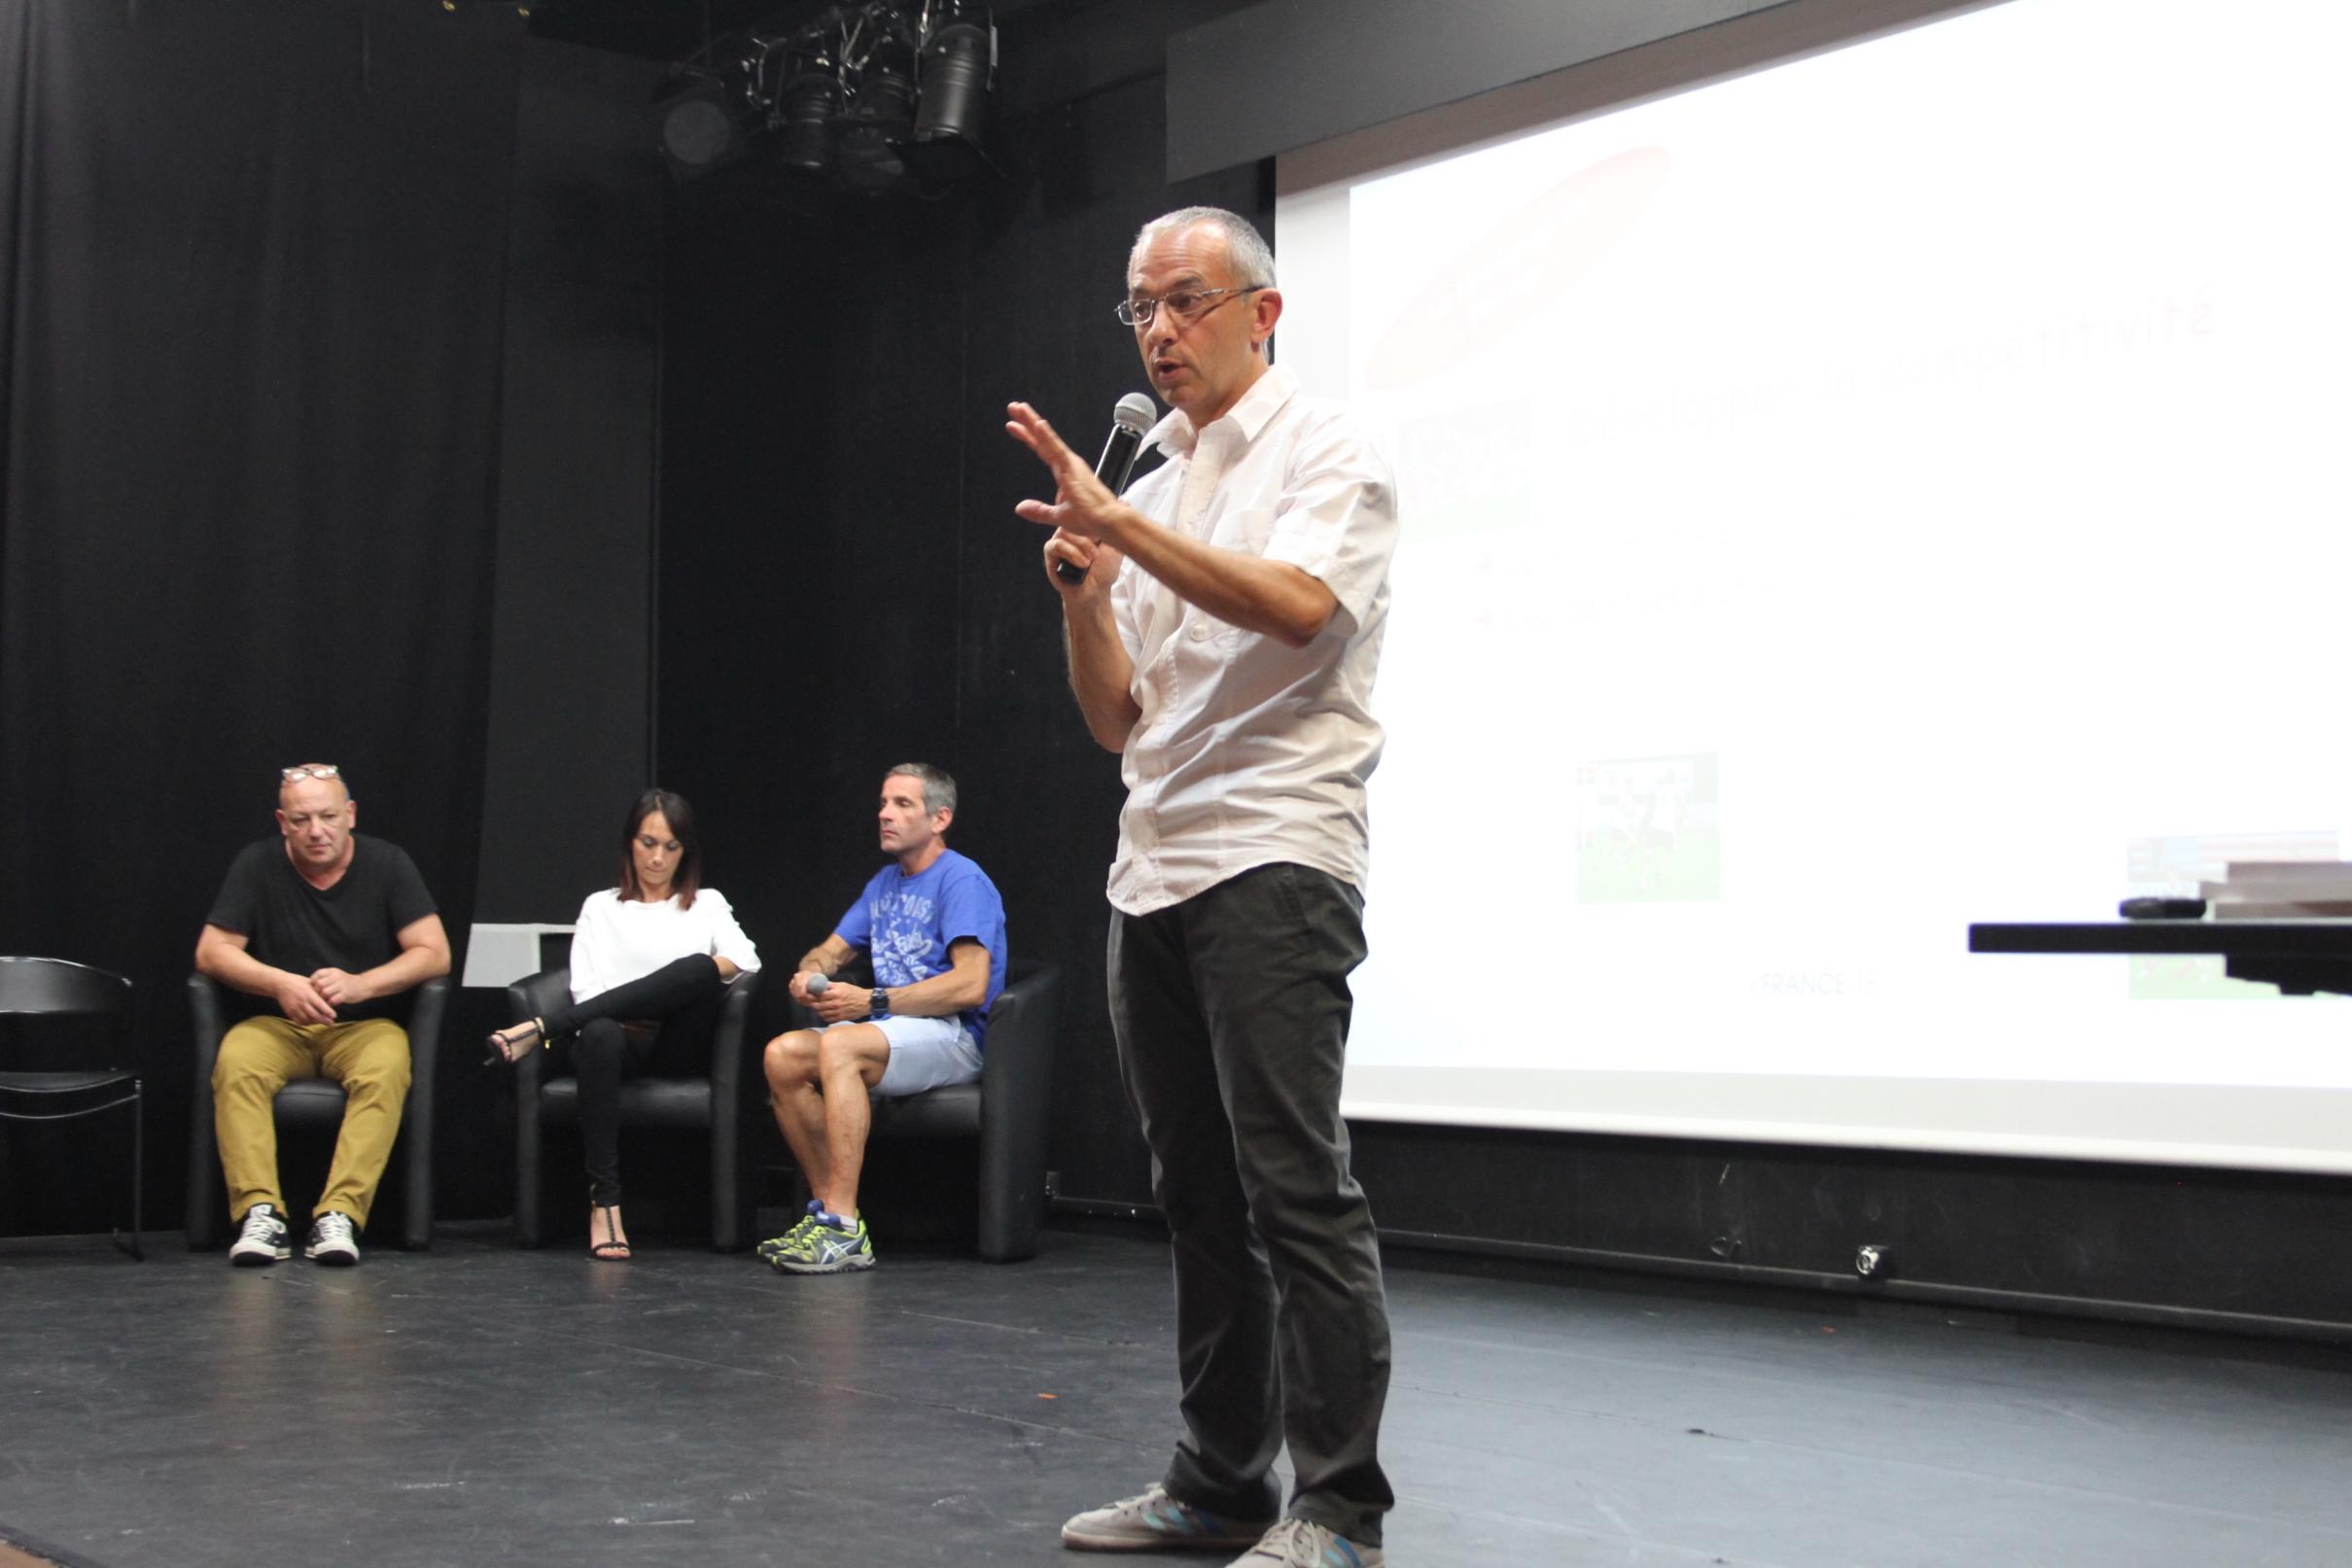 Ajaccio : « Evaluer et travailler son mental », une conférence de Christian Ramos et Philippe Agostini